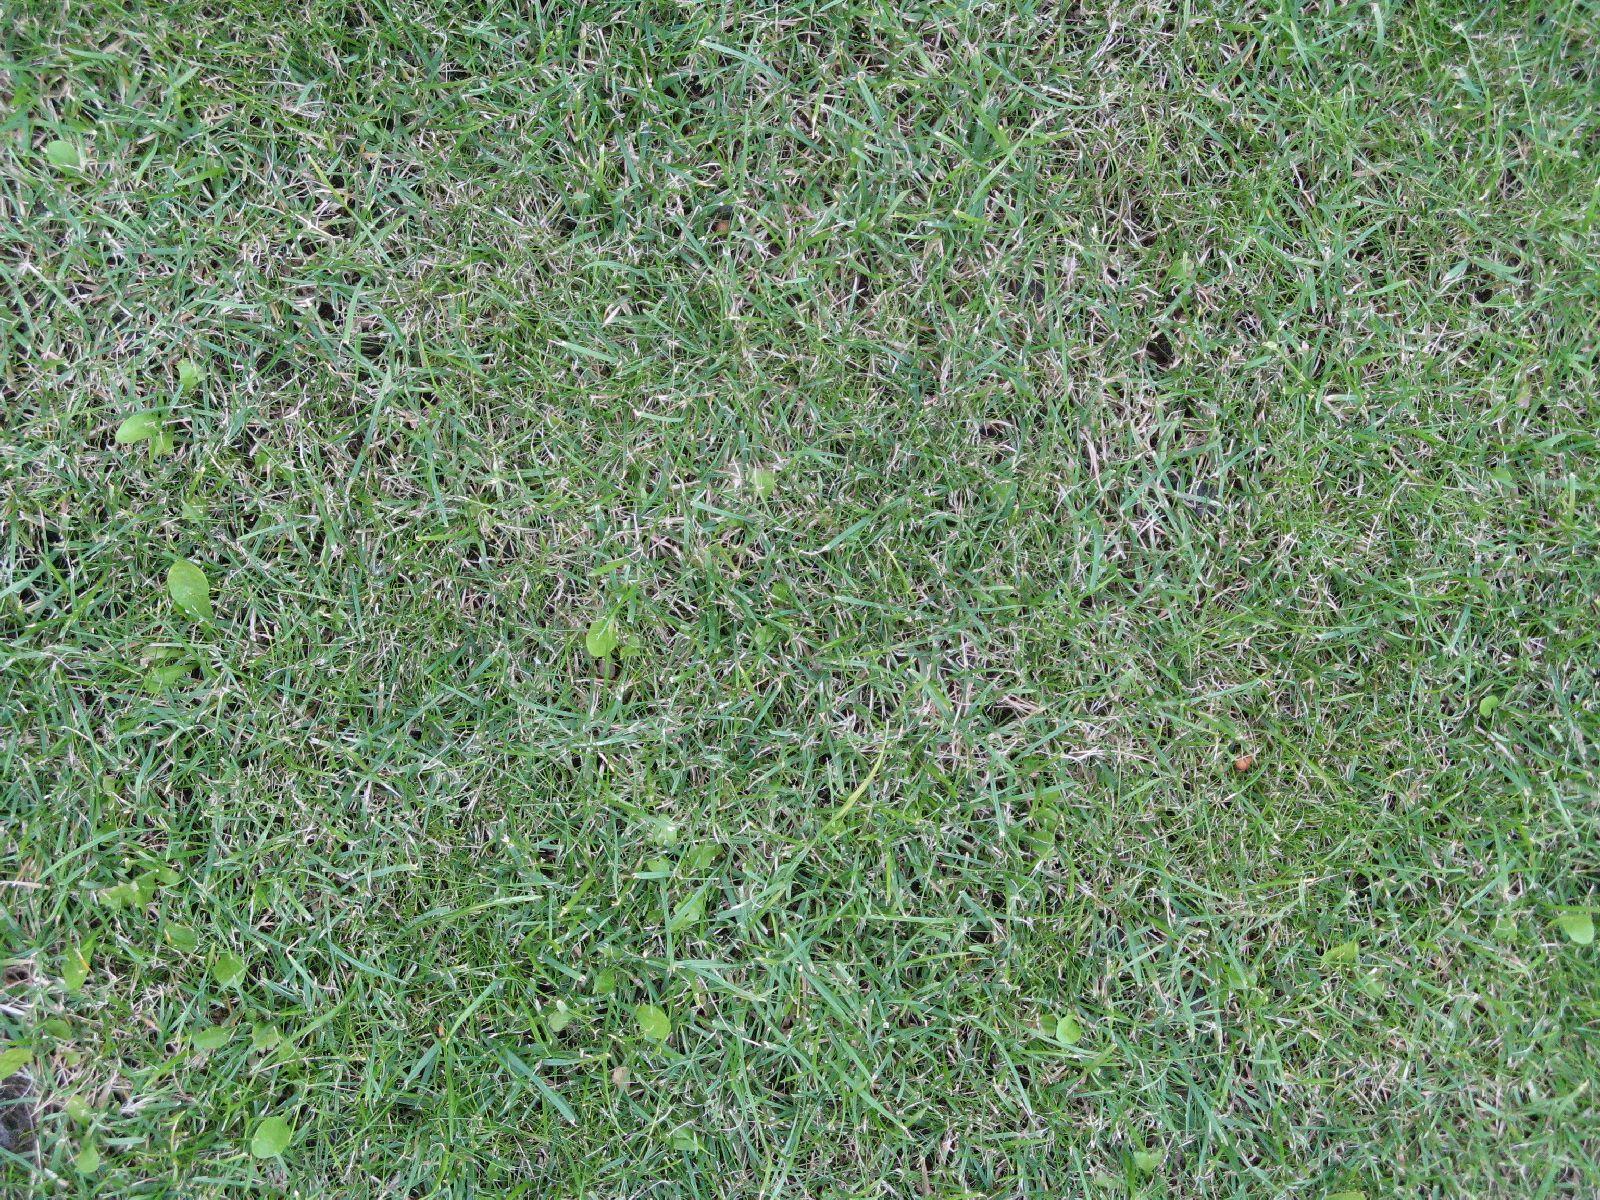 Boden-Gras-Moos-Blumen_Textur_B_00869